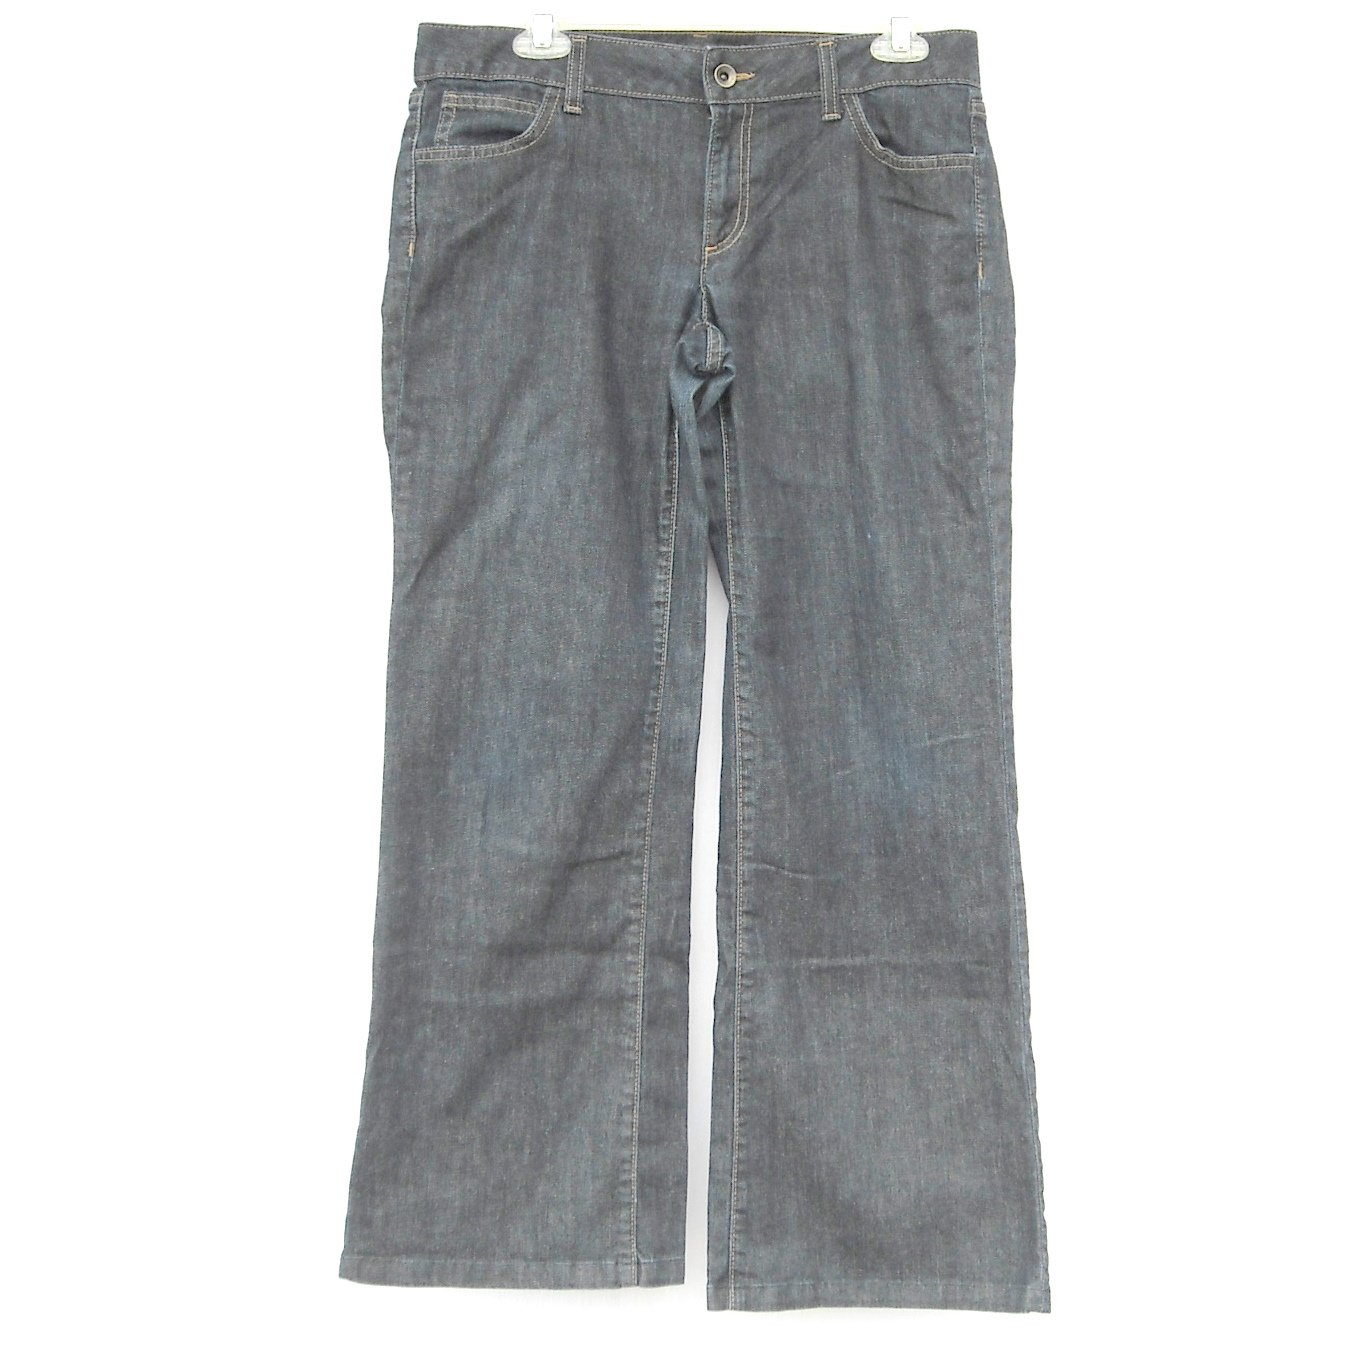 Banana Republic Womens Blue Jeans Size 8